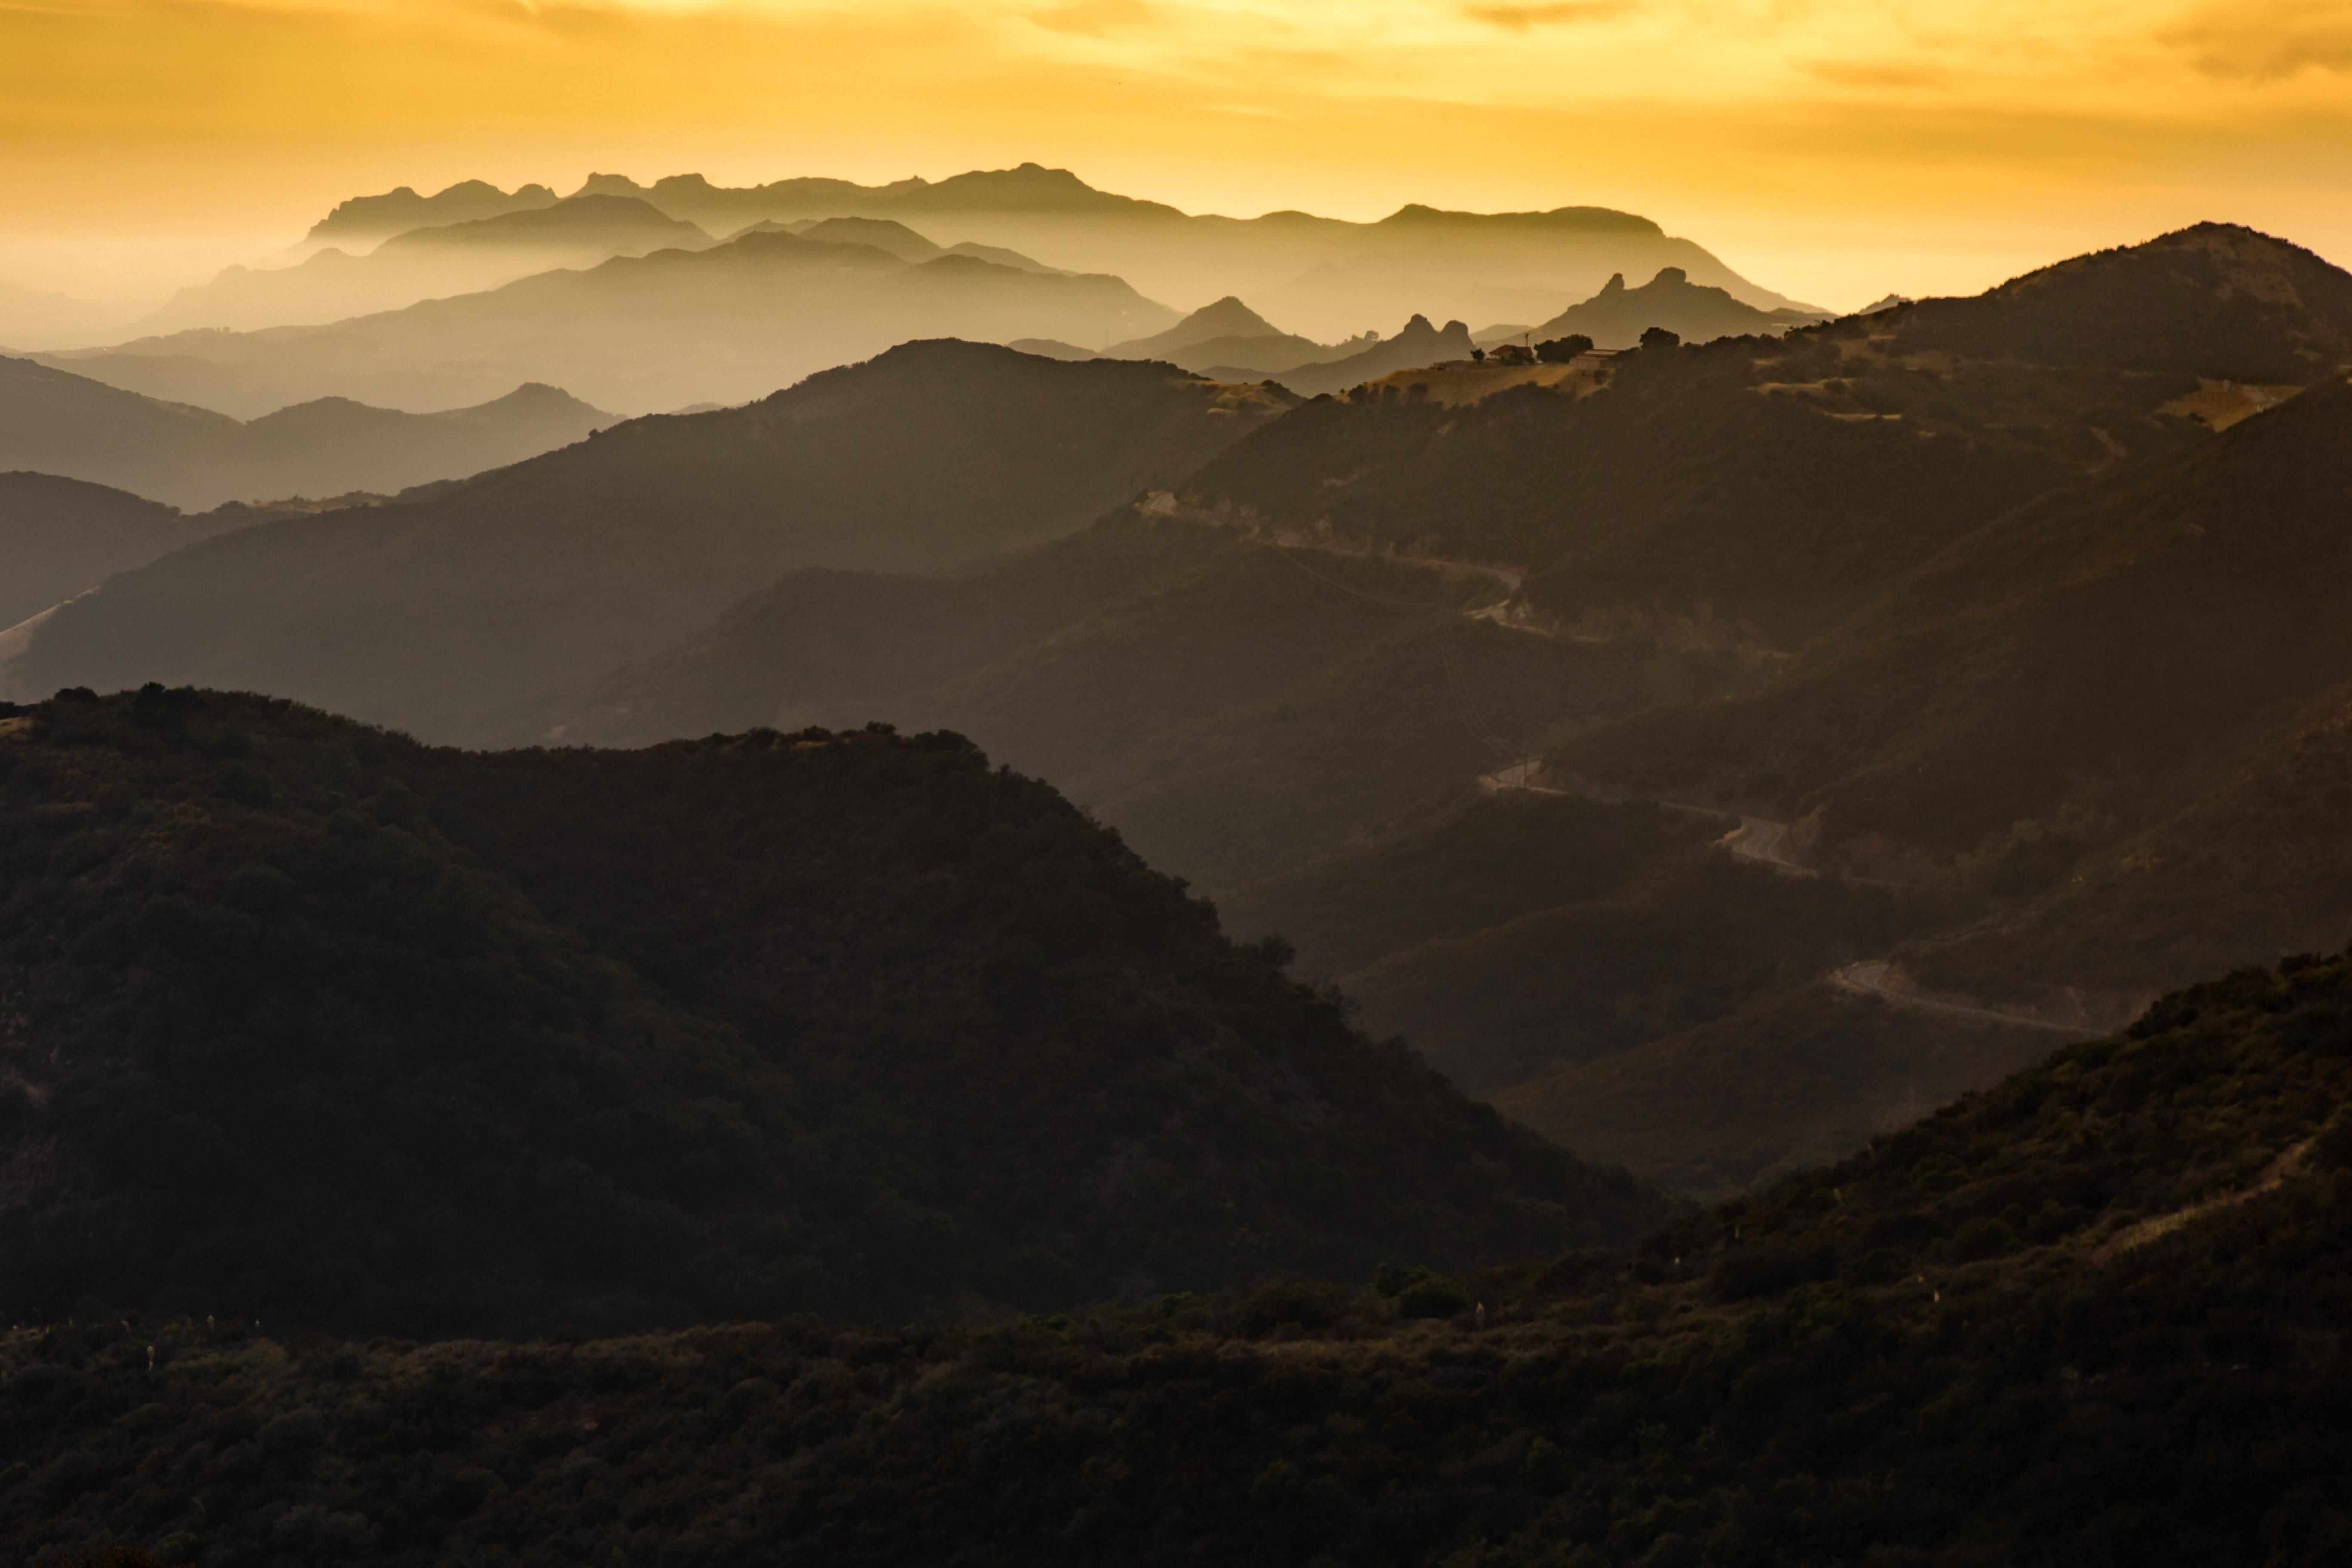 Sunset over Latigo Canyon Road - Santa Monica Mountains CA [5472 x 3648] [OC] via Classy Bro